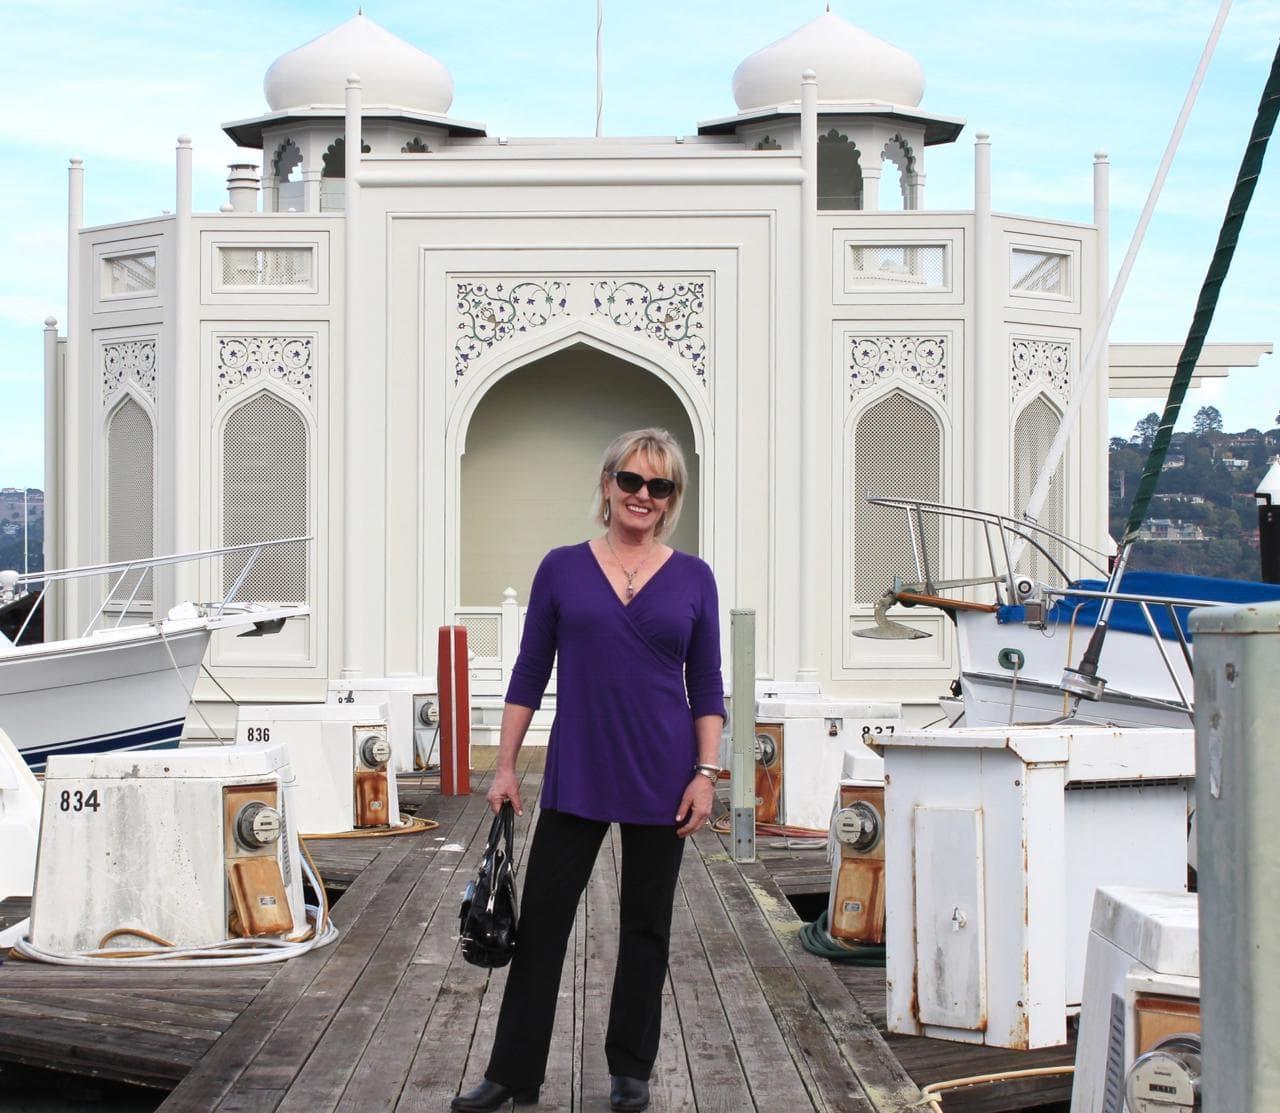 The Taj Mahal Houseboat